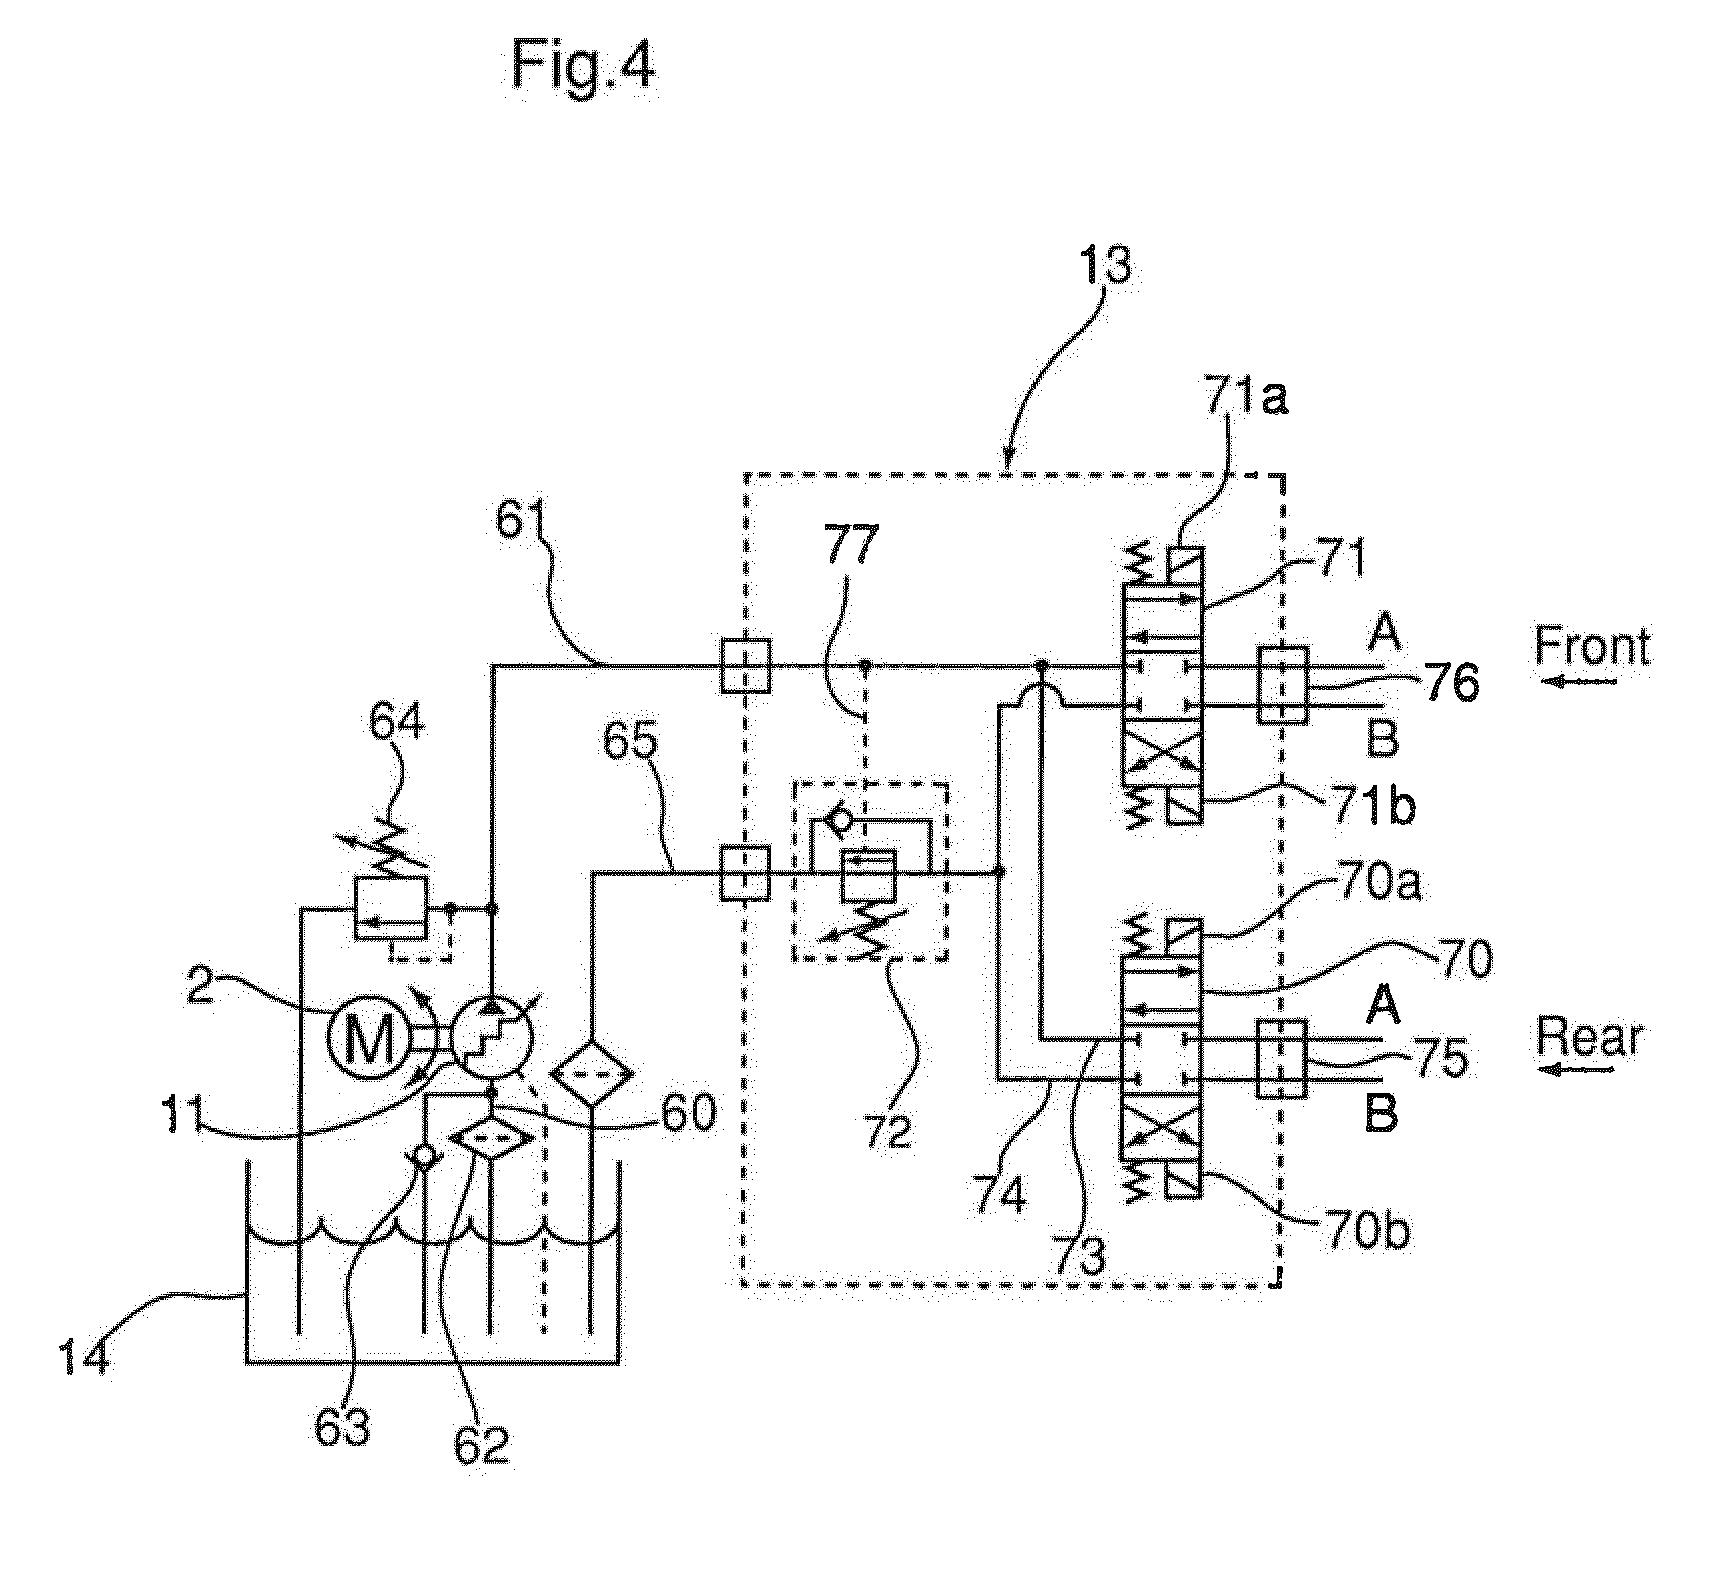 engine driven compressor diagram clutch diagram wiring